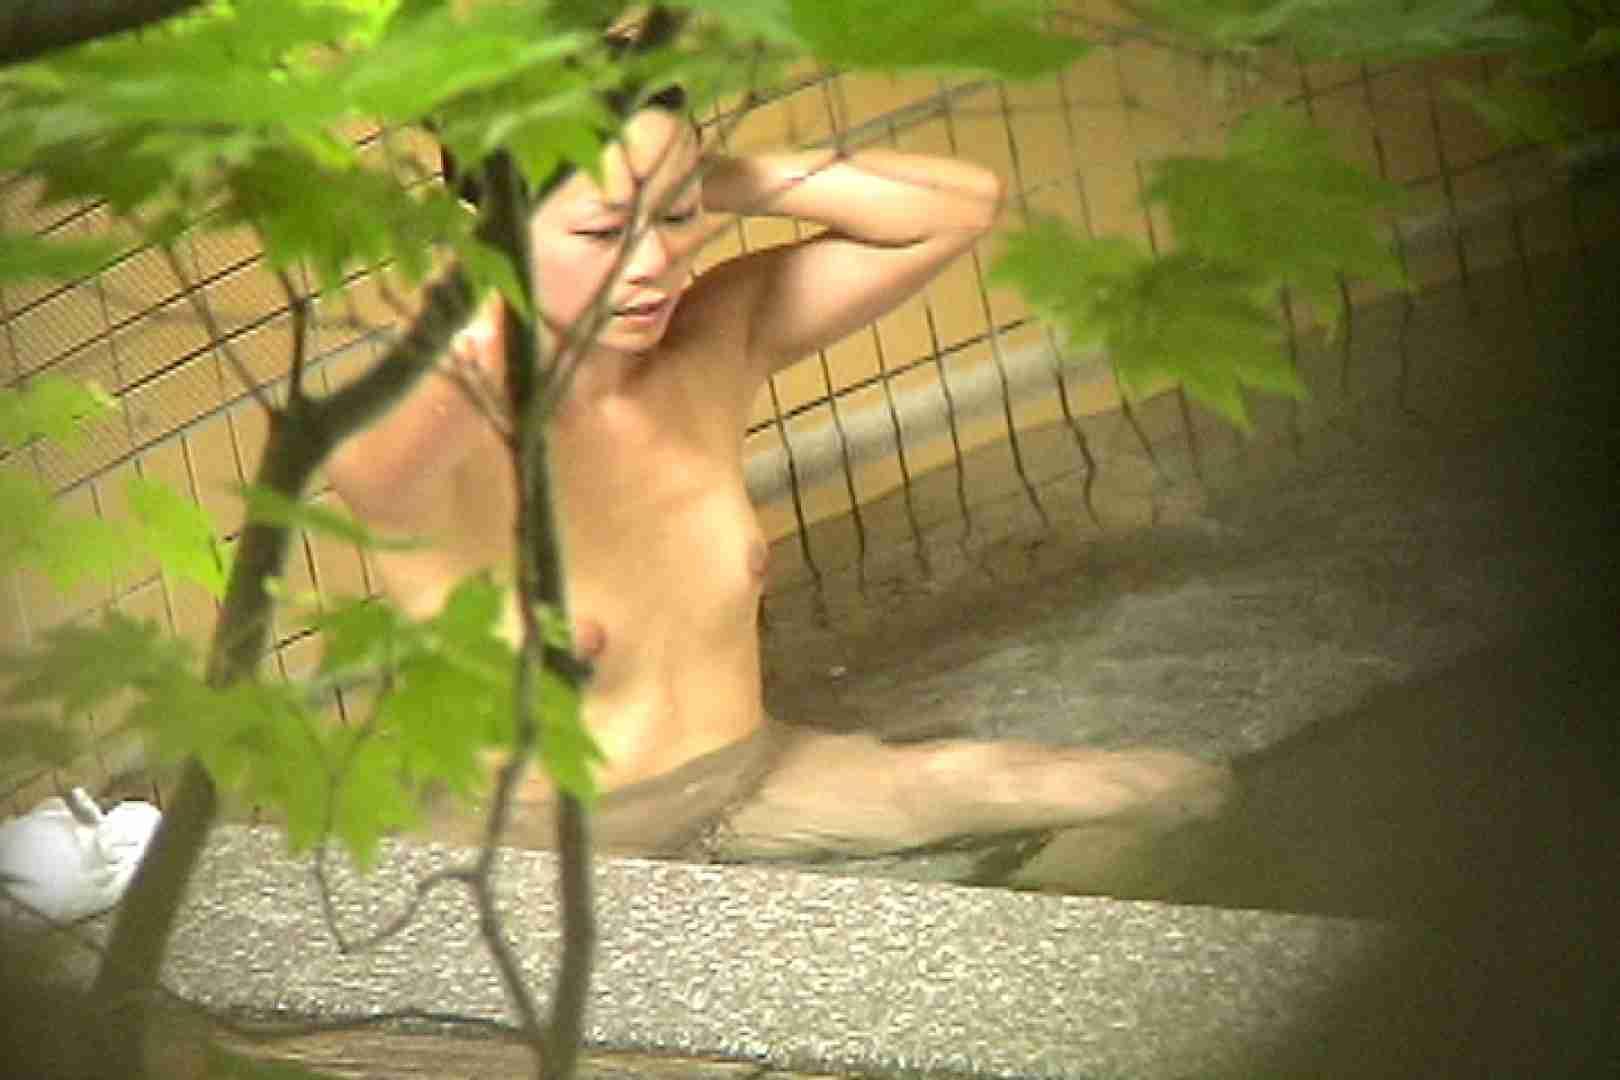 Aquaな露天風呂Vol.706 盗撮シリーズ | 露天風呂編  106PIX 89